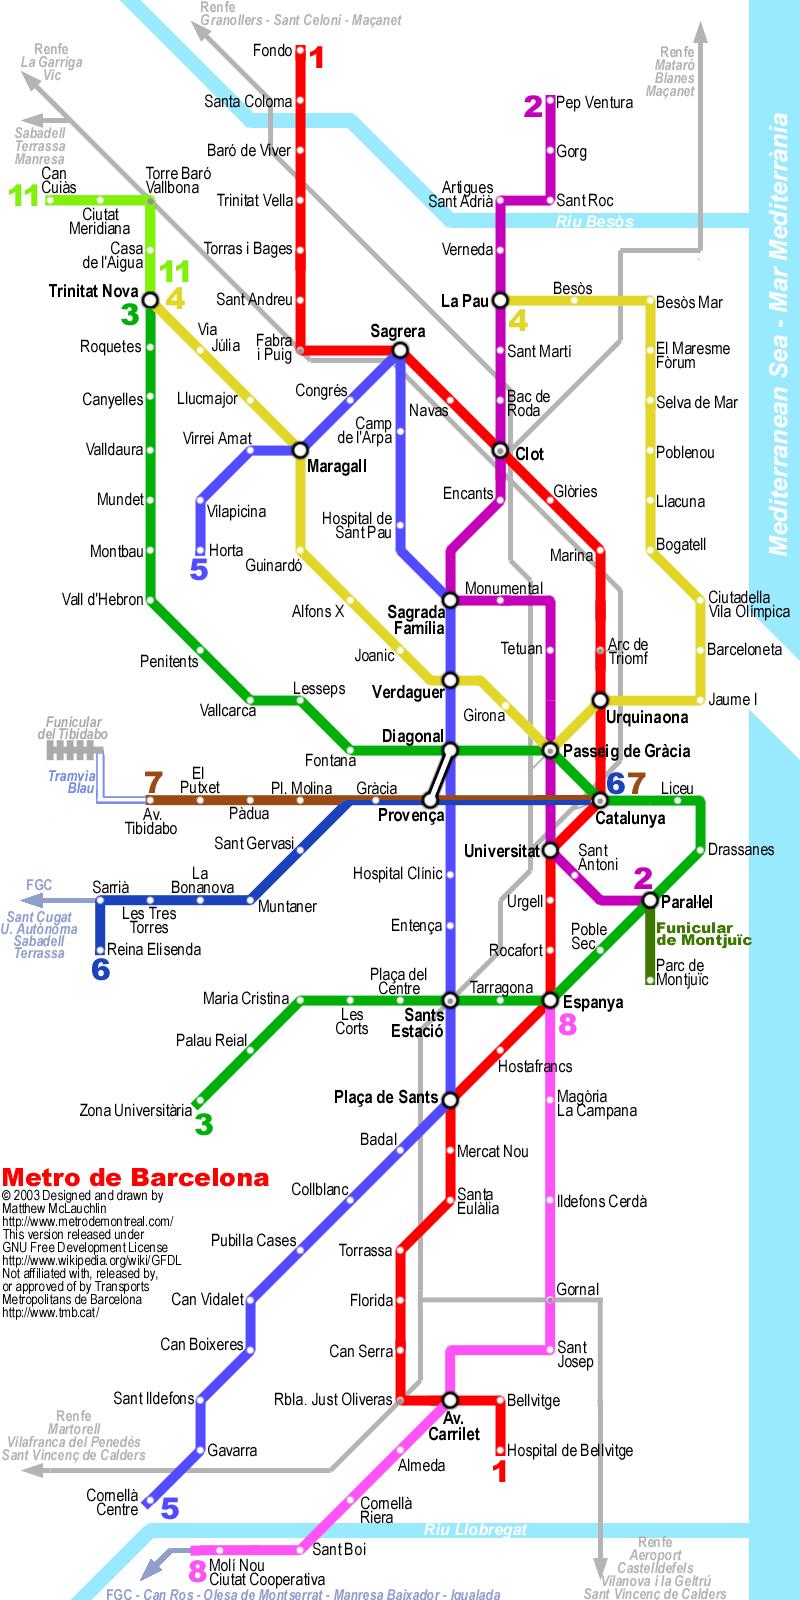 Image:Metro Barcelona Map.png